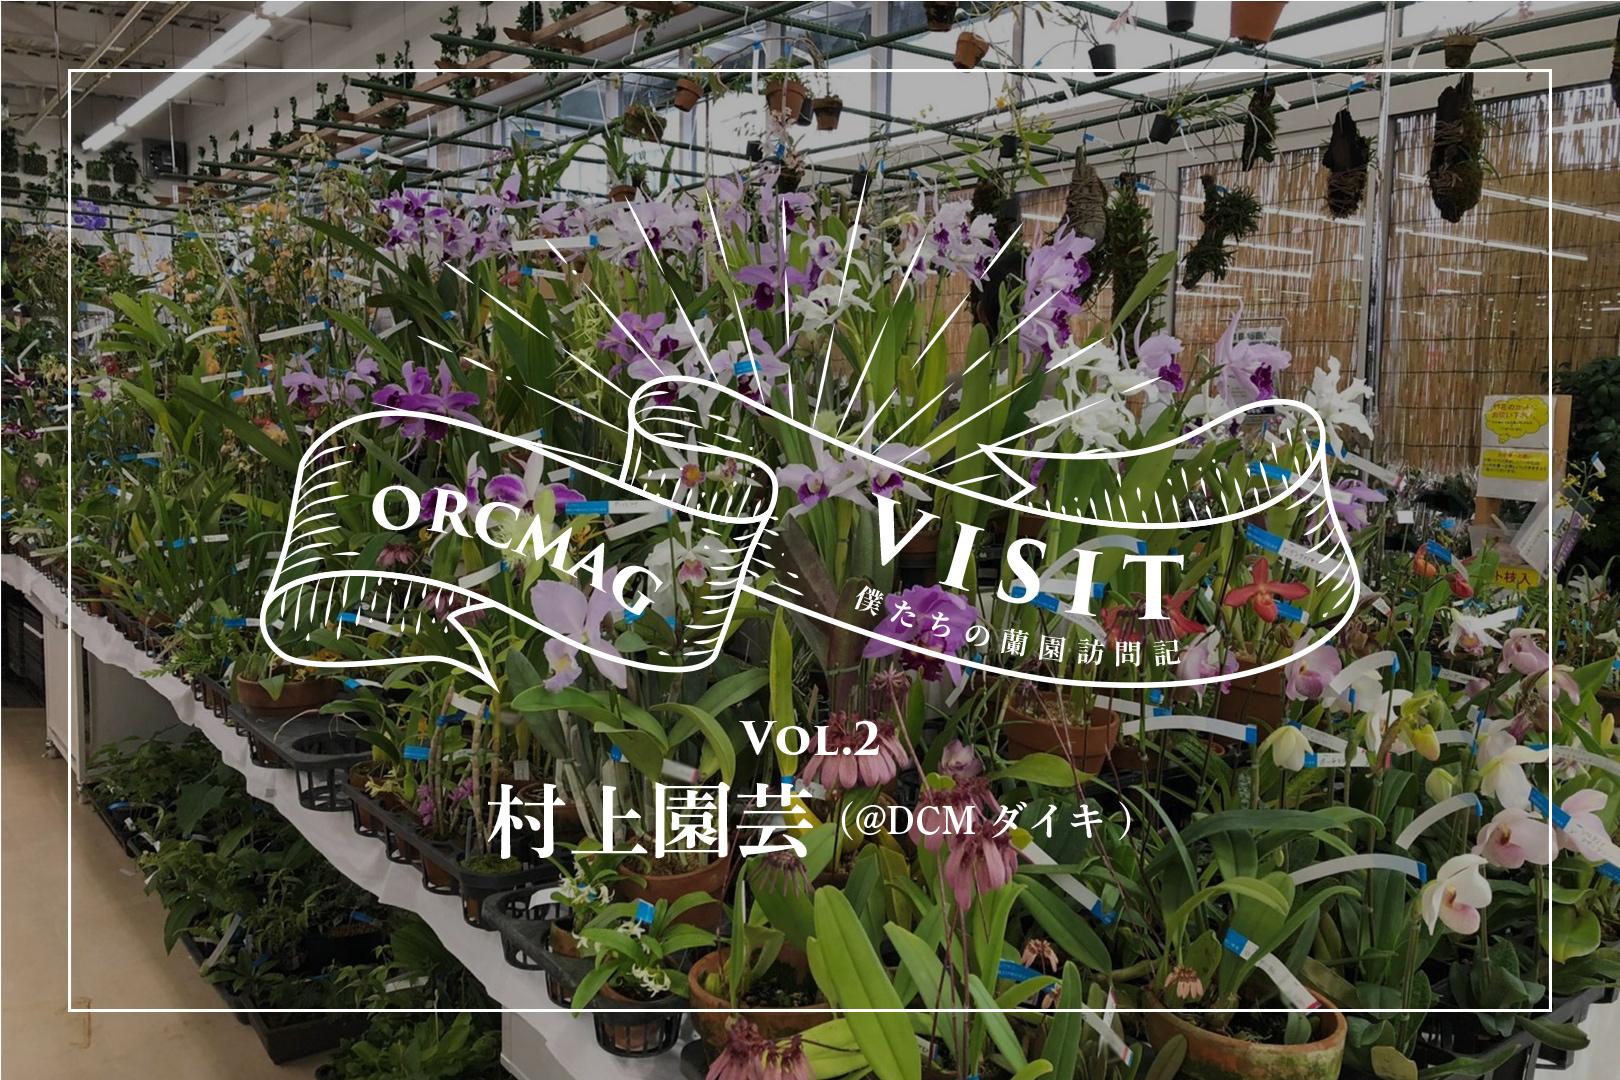 orcmag visit 村上園芸